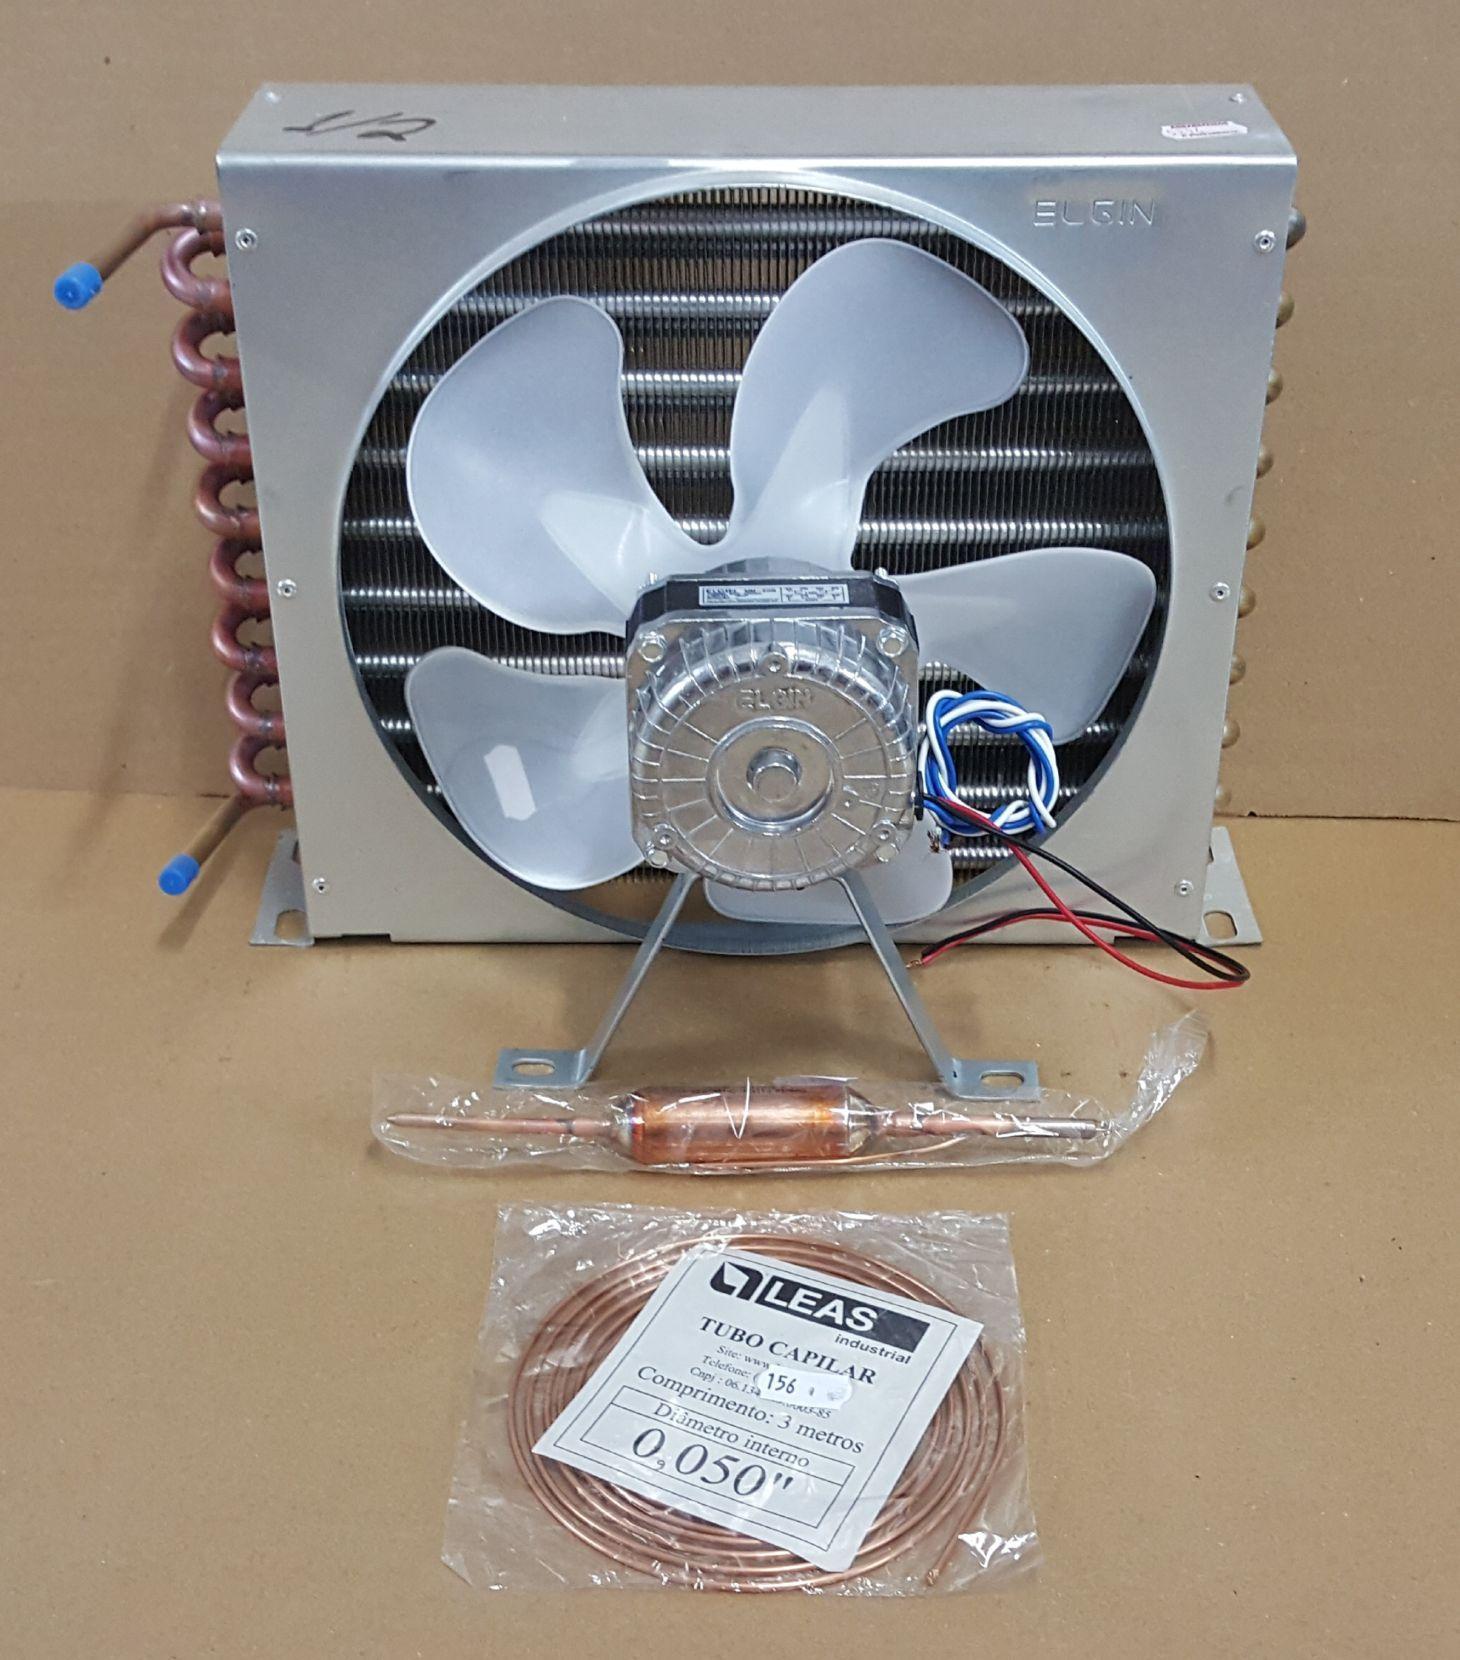 Kit Condensador Para Motor 1/2 Hp (35 x 9 x 27 cm)